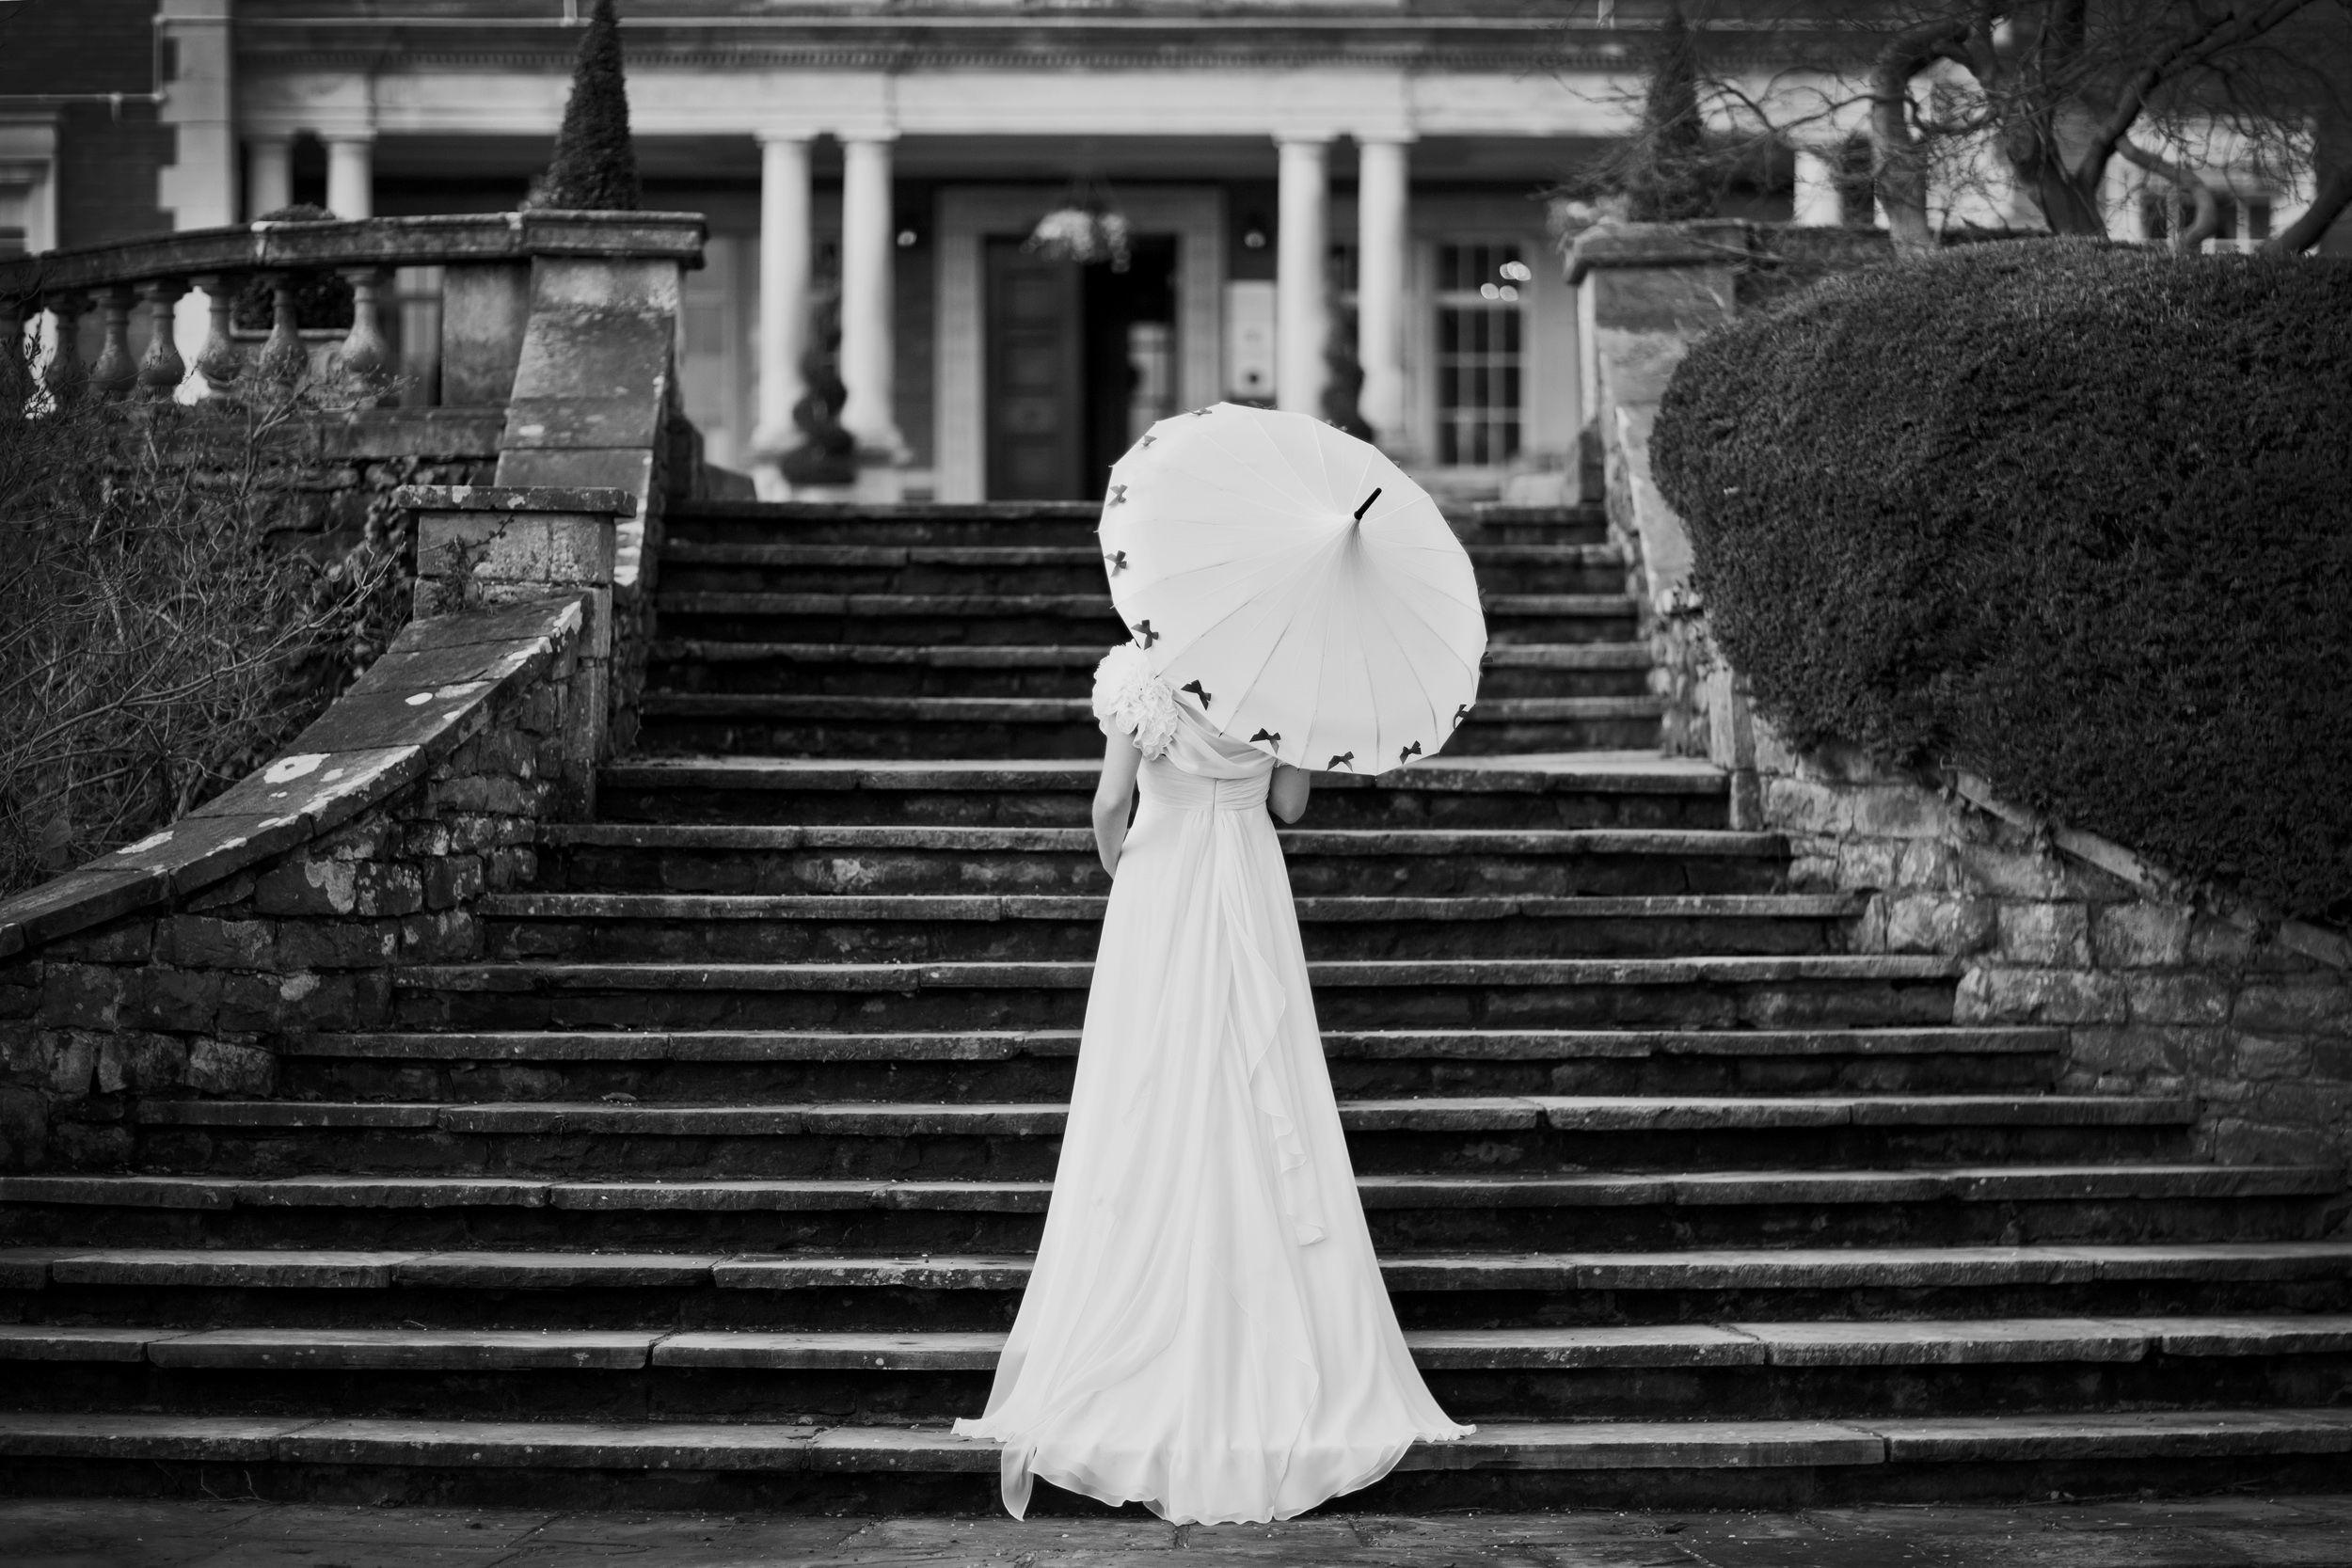 Loveumbrella wedding photography pinterest wedding umbrellas